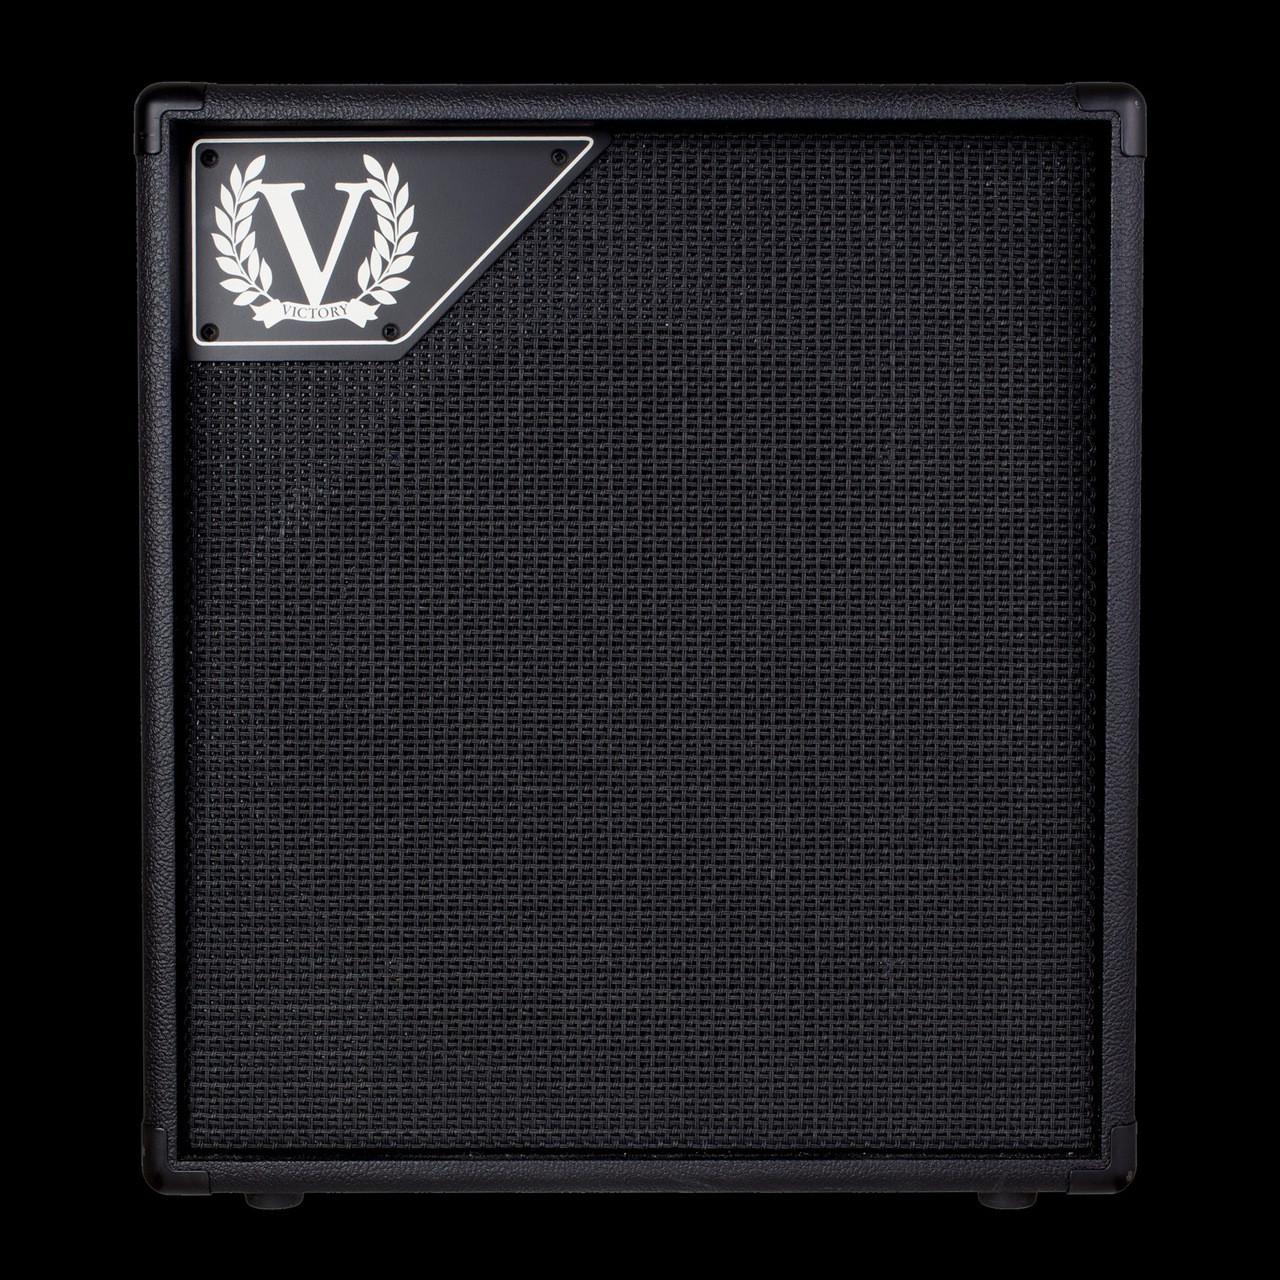 Kustom 1x12 Cabinet Victory V112v 1x12 Cabinet With Celestion Vintage 30 Wildwire